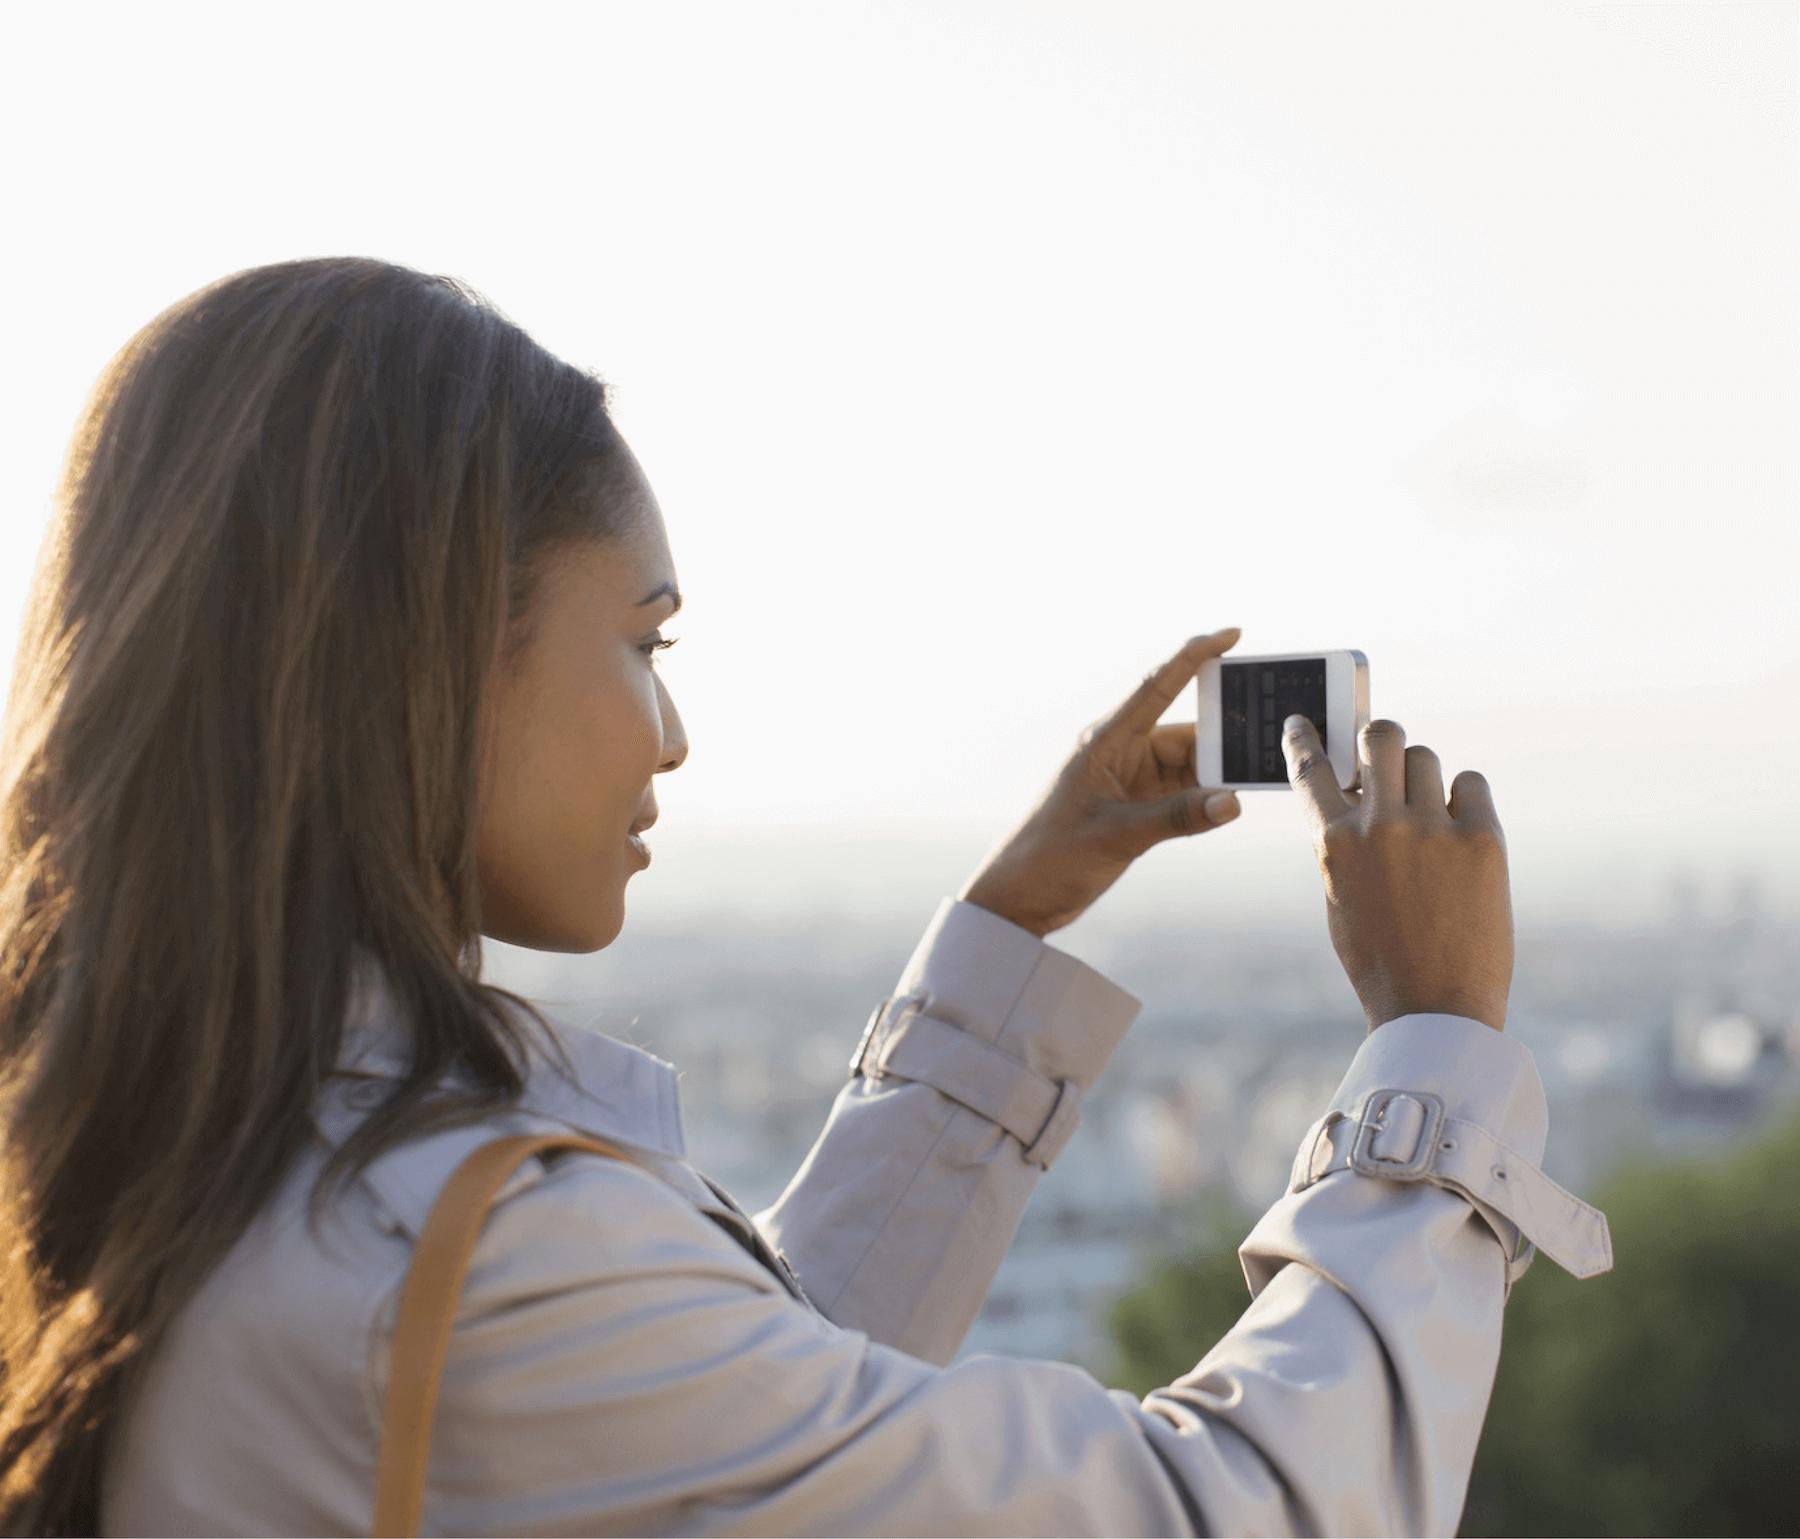 Woman taking Santorini sunset photo with iPhone